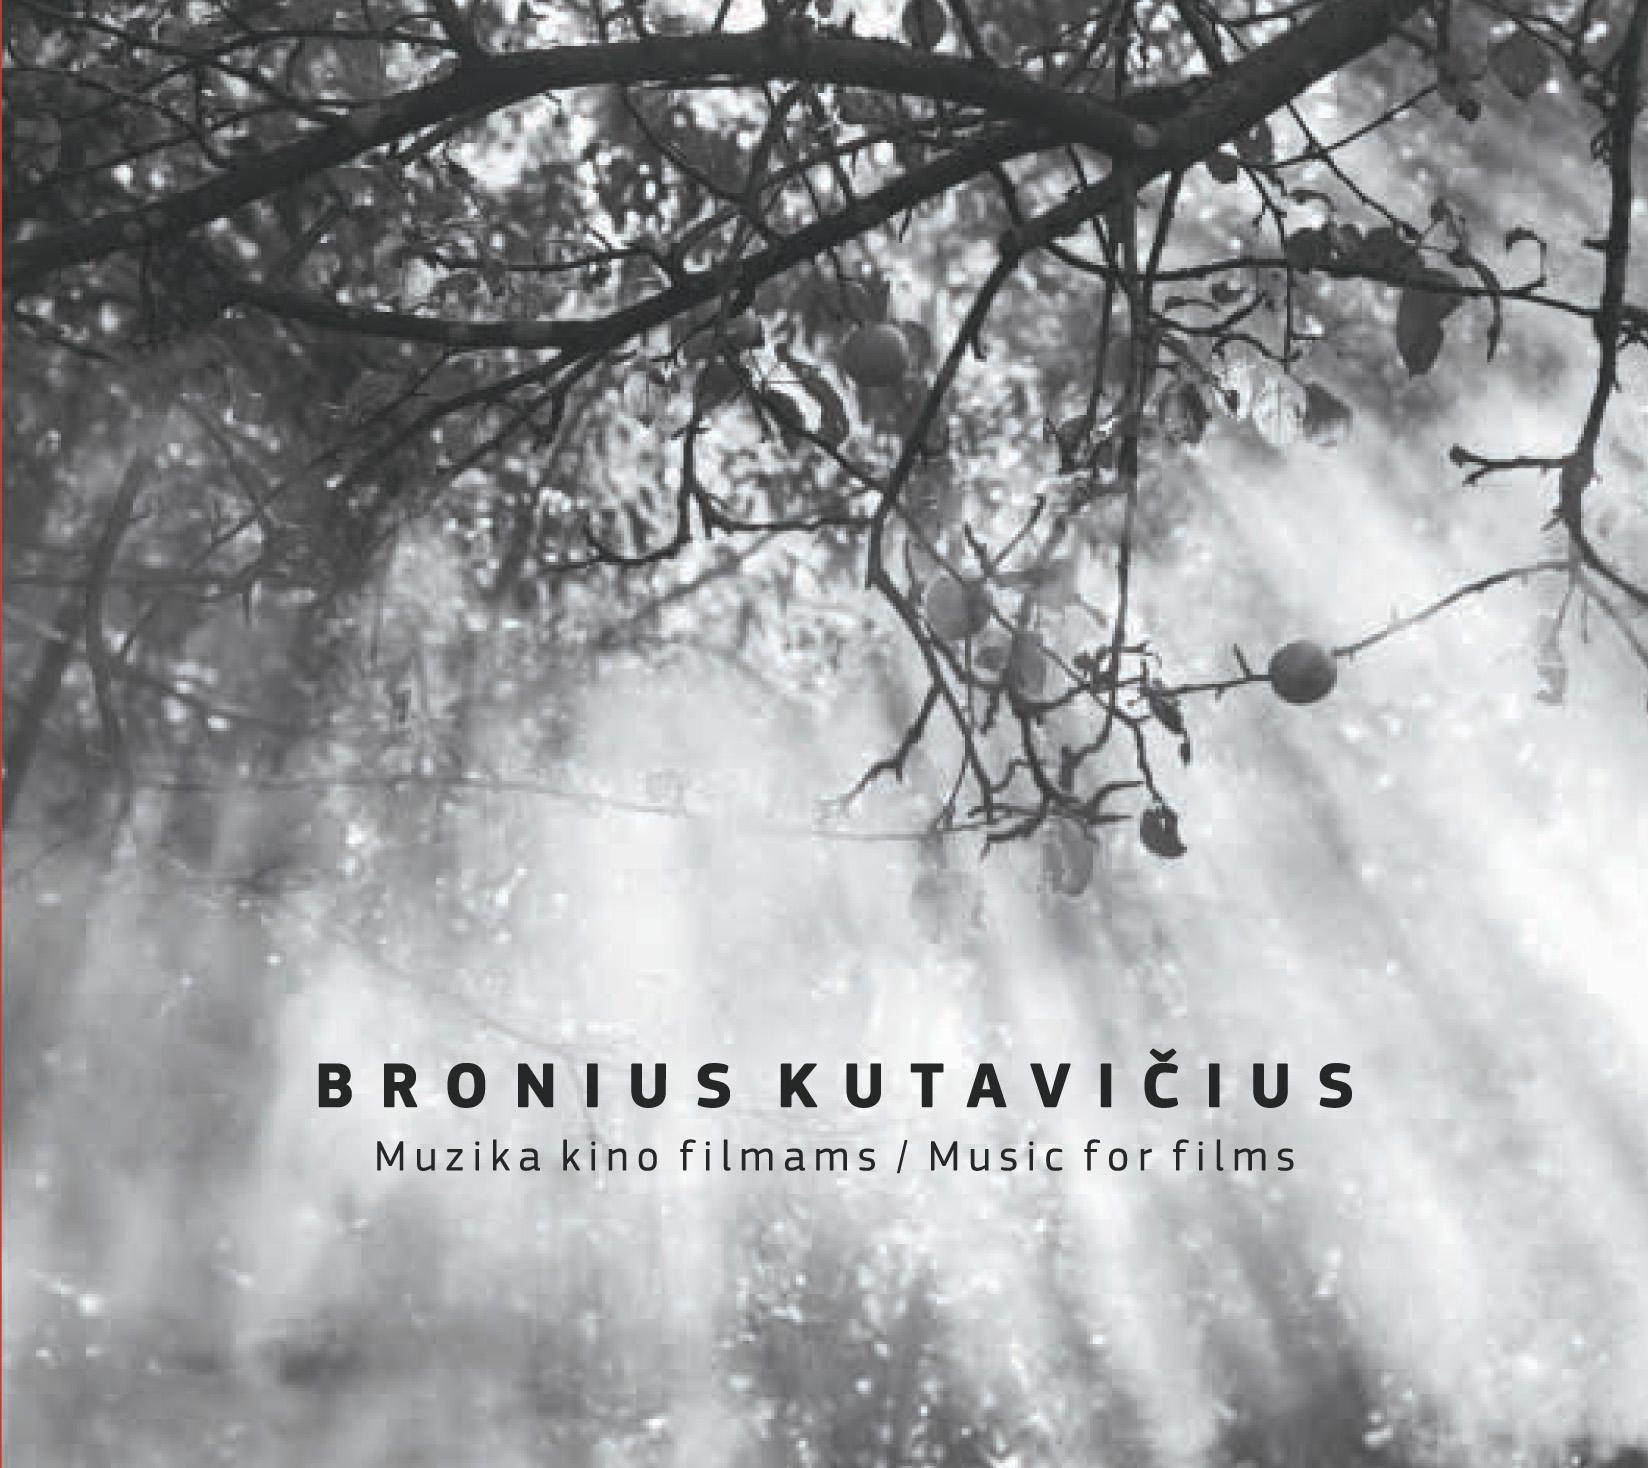 Bronius Kutavičius/ Music for films